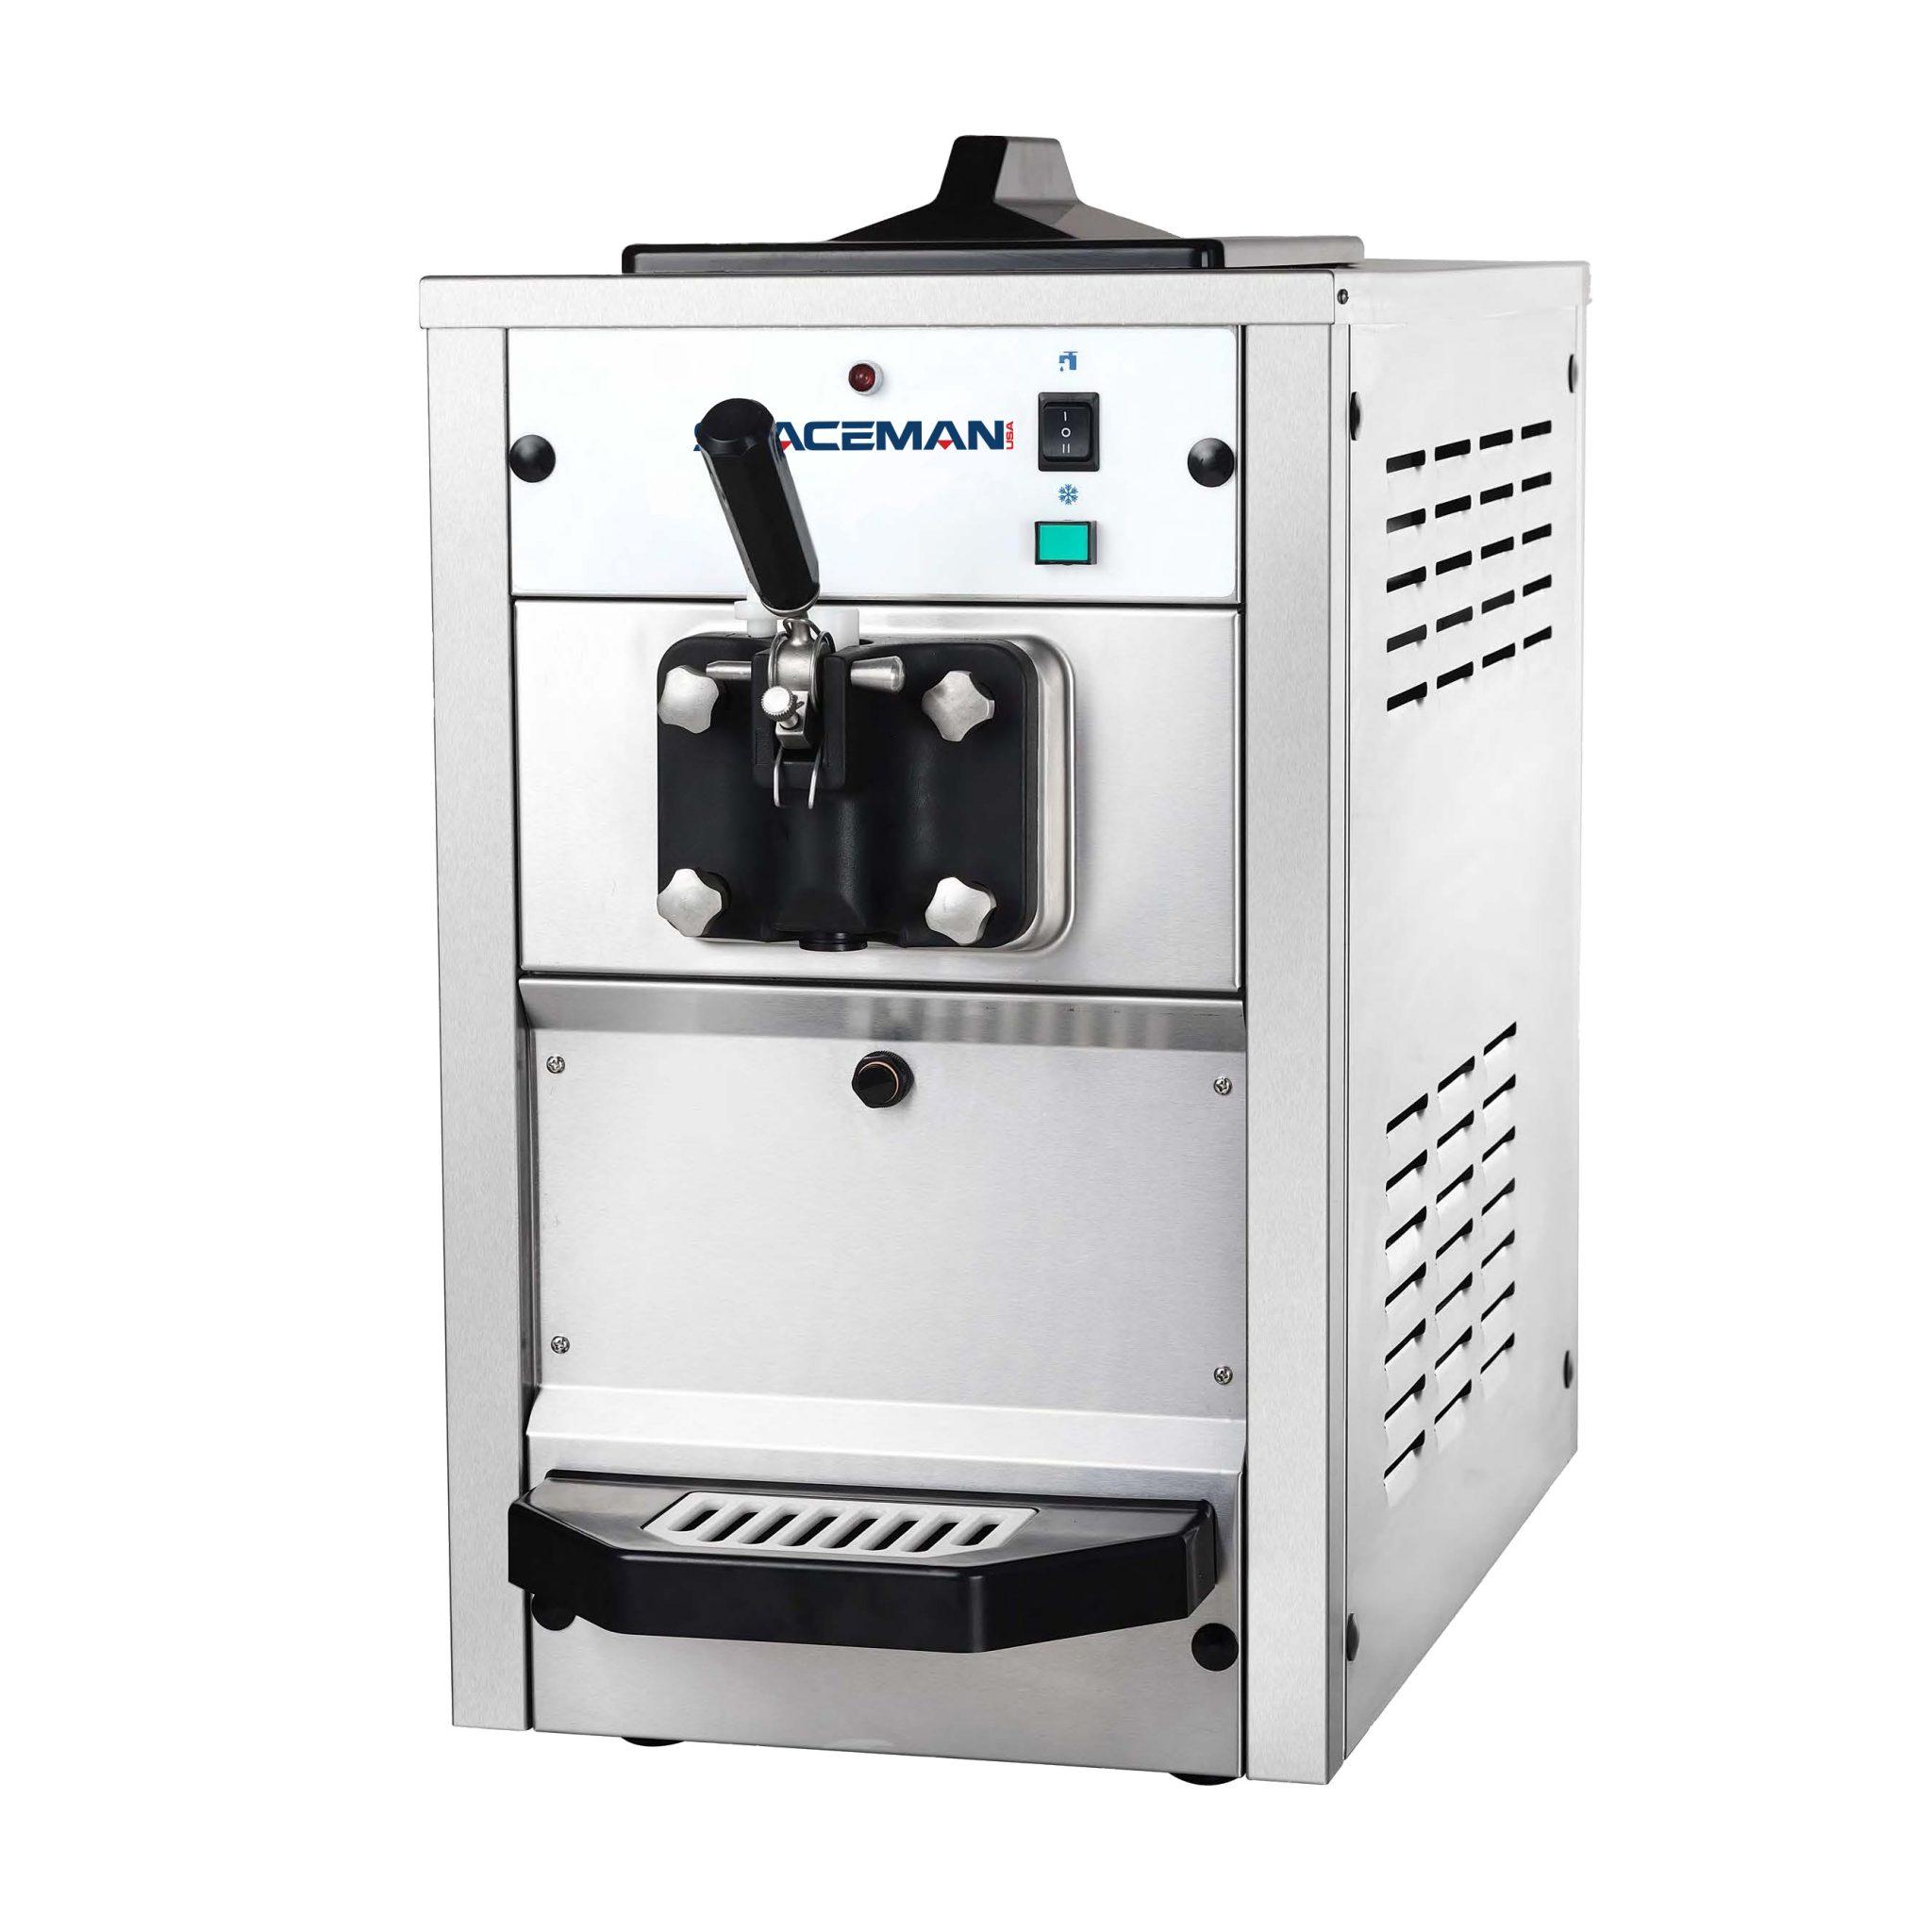 spaceman ice cream machine manual